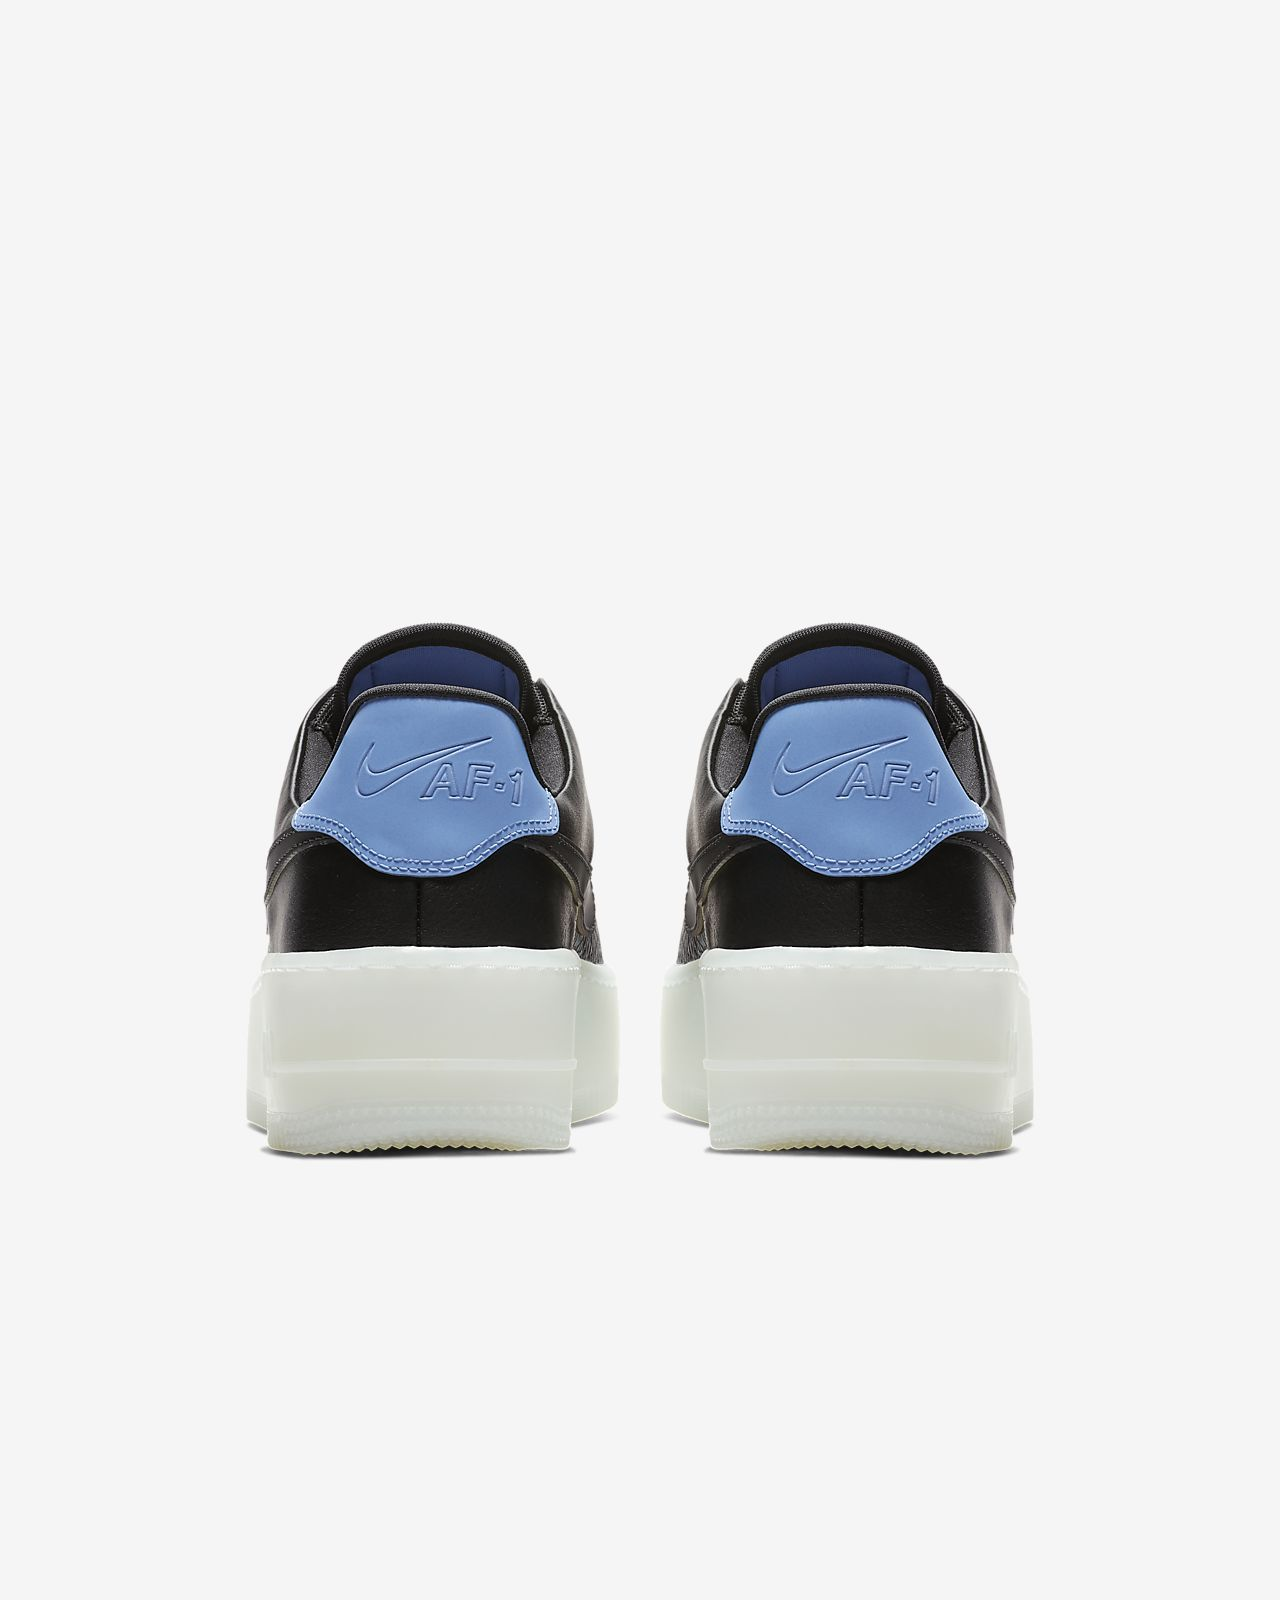 bbcdcb6bf67 Nike Air Force 1 Sage Low LX Women s Shoe. Nike.com CA